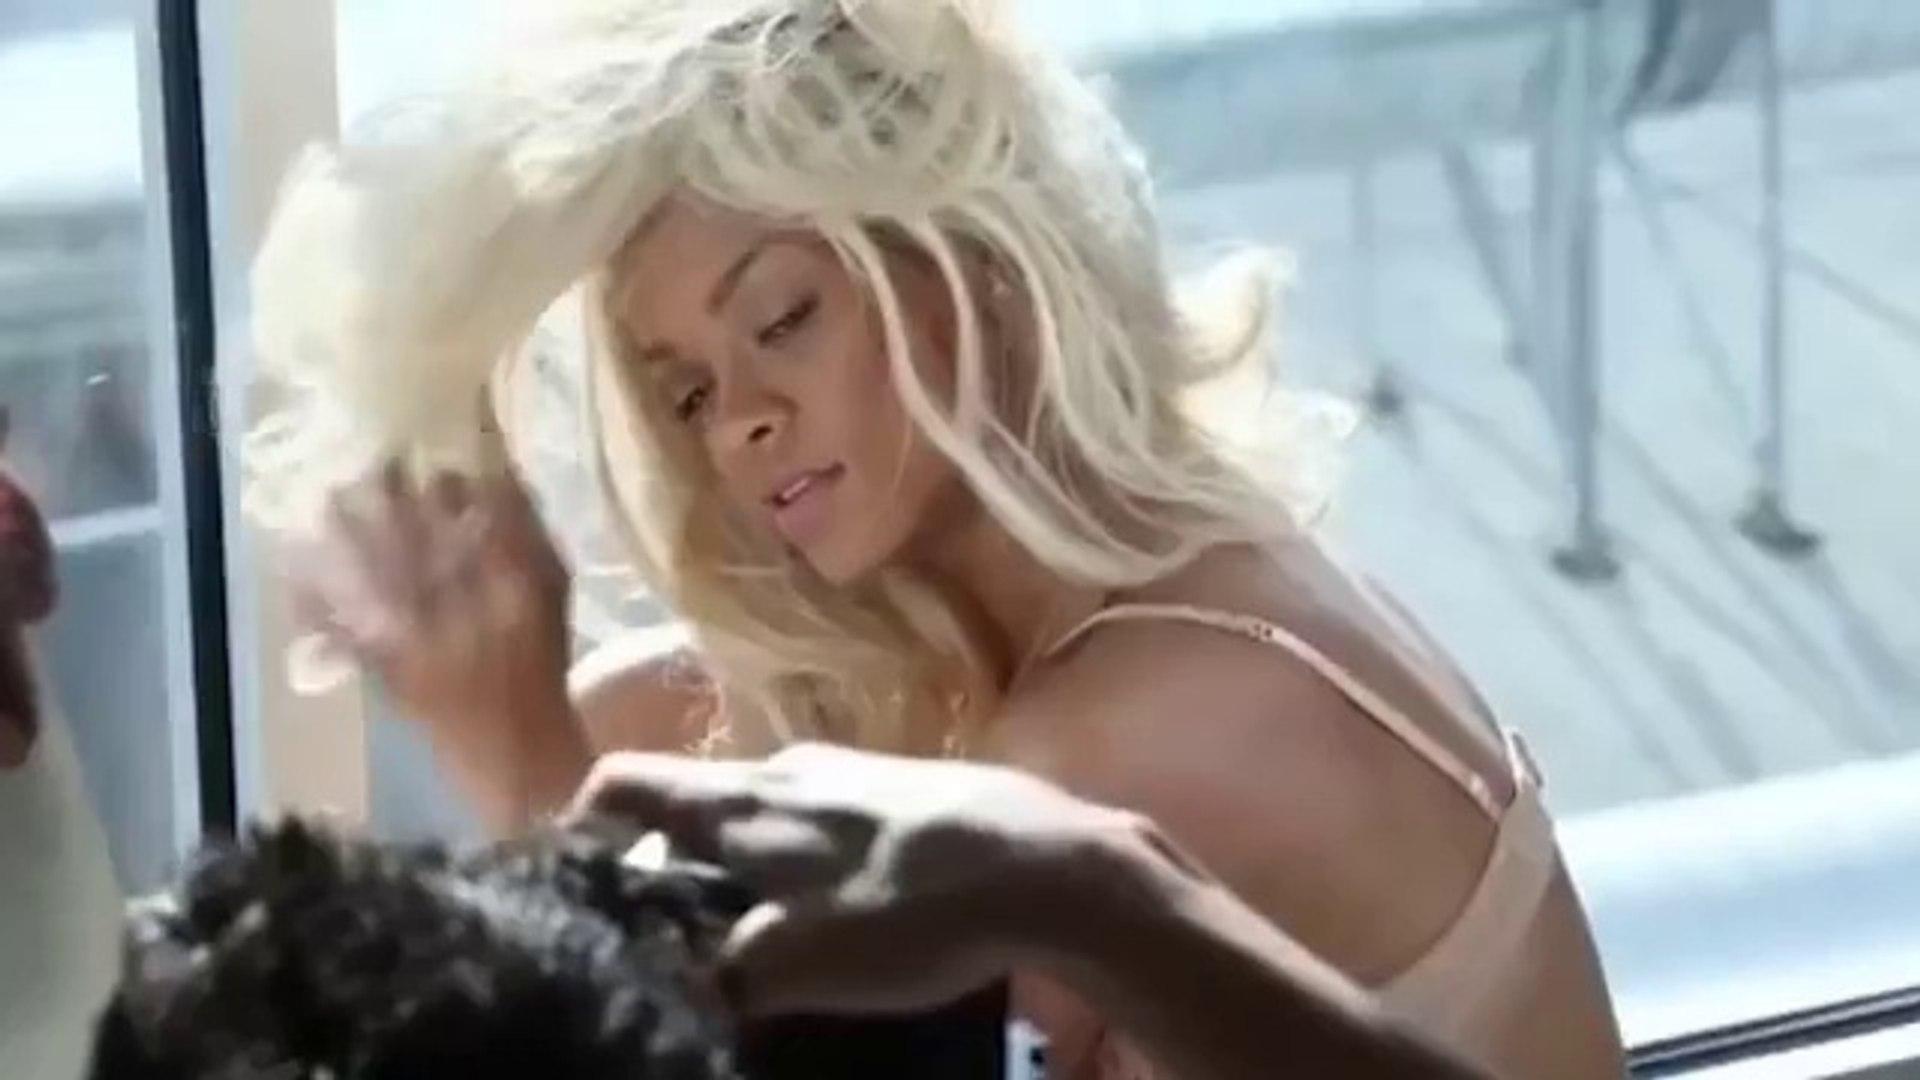 Behind The Scenes - Rihanna's Photoshoots